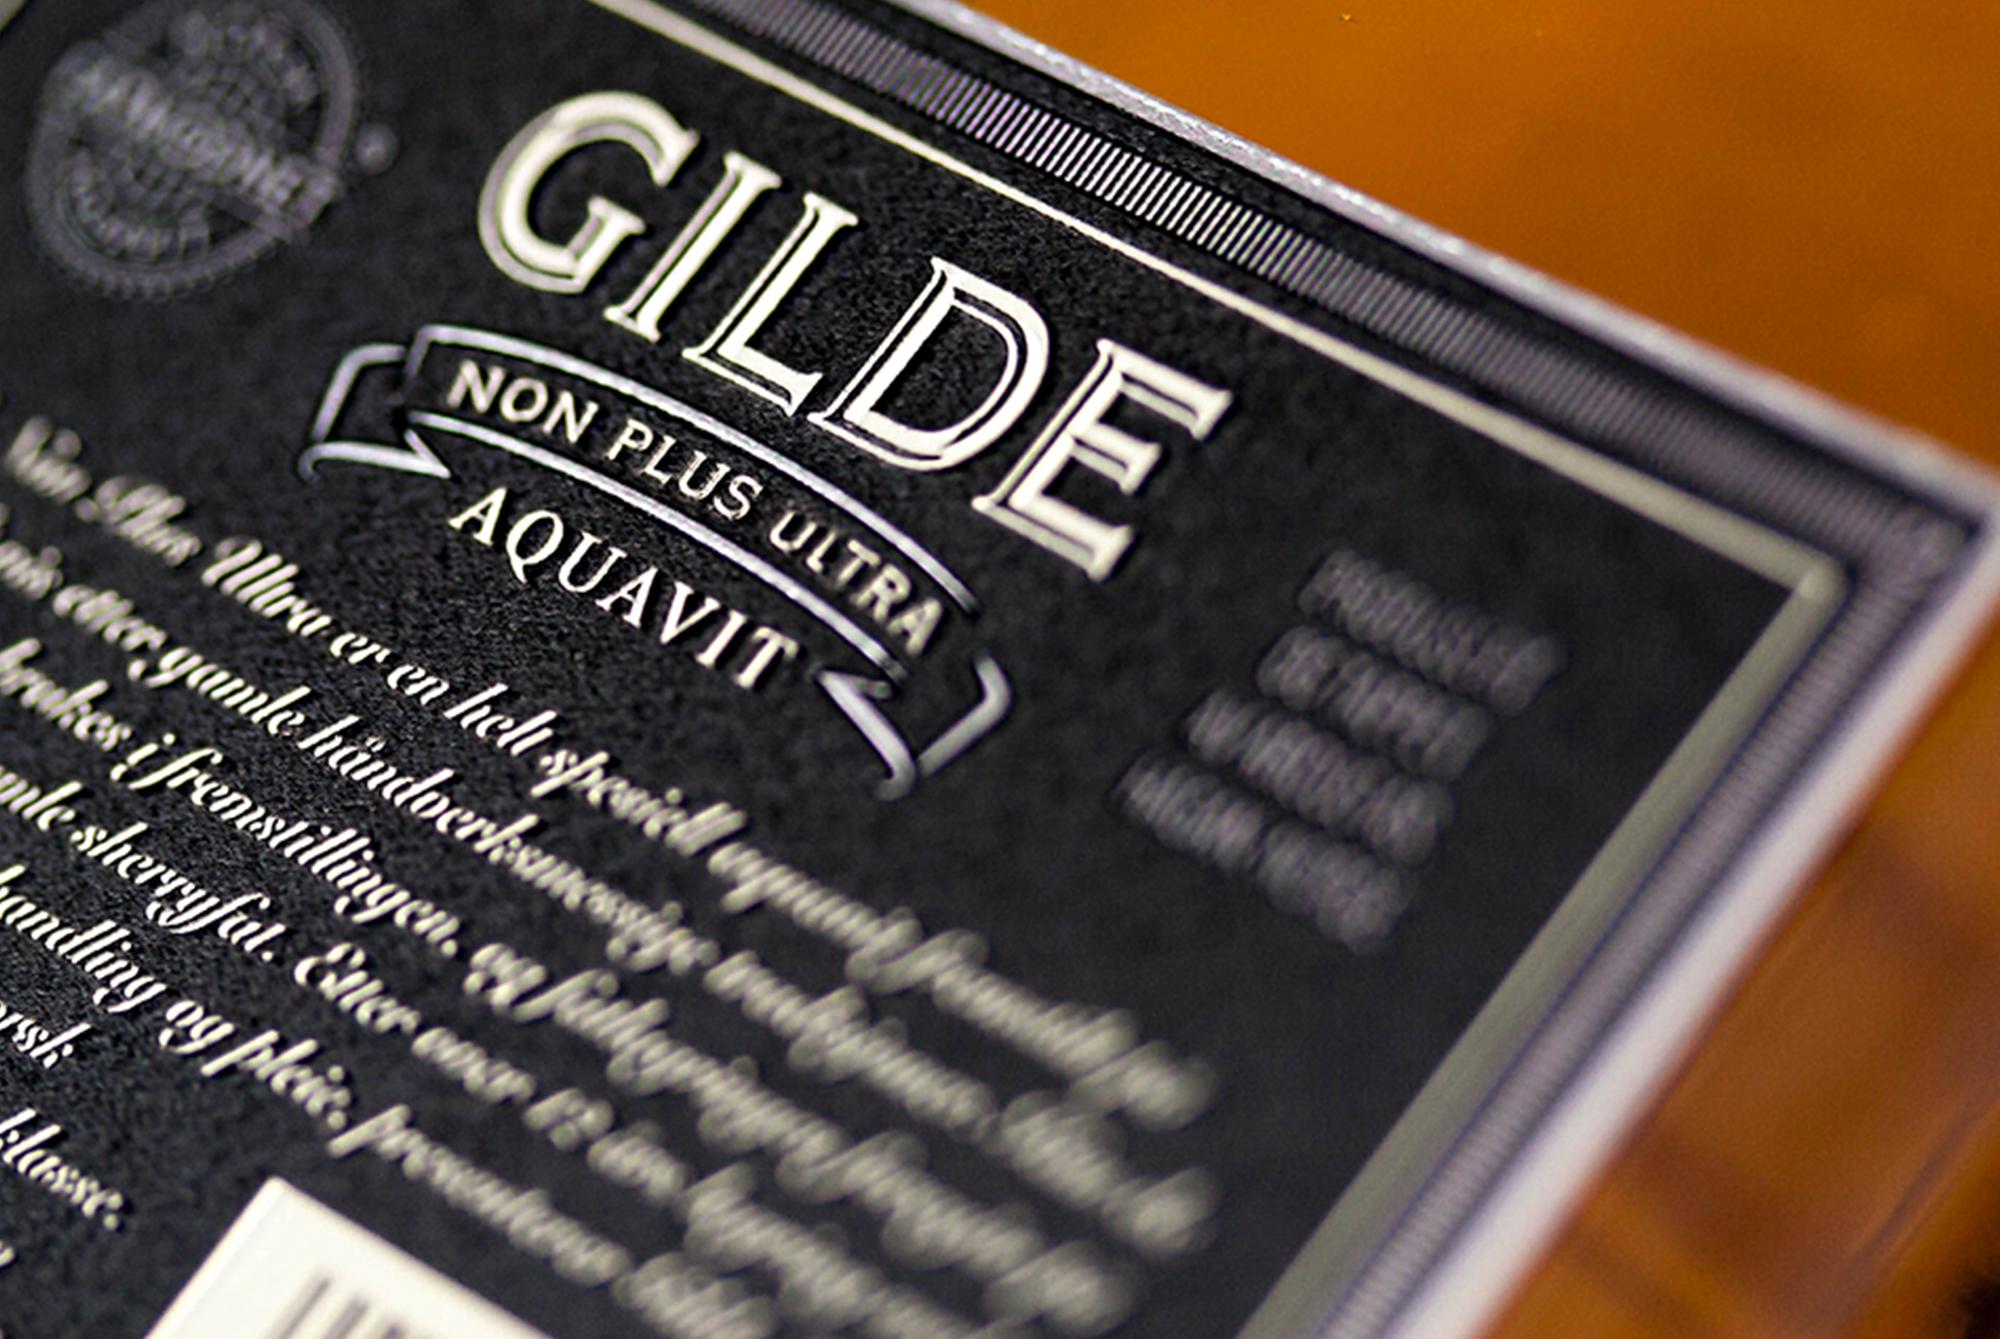 Gilde Aquavit Non Plus Ultra - Back detail